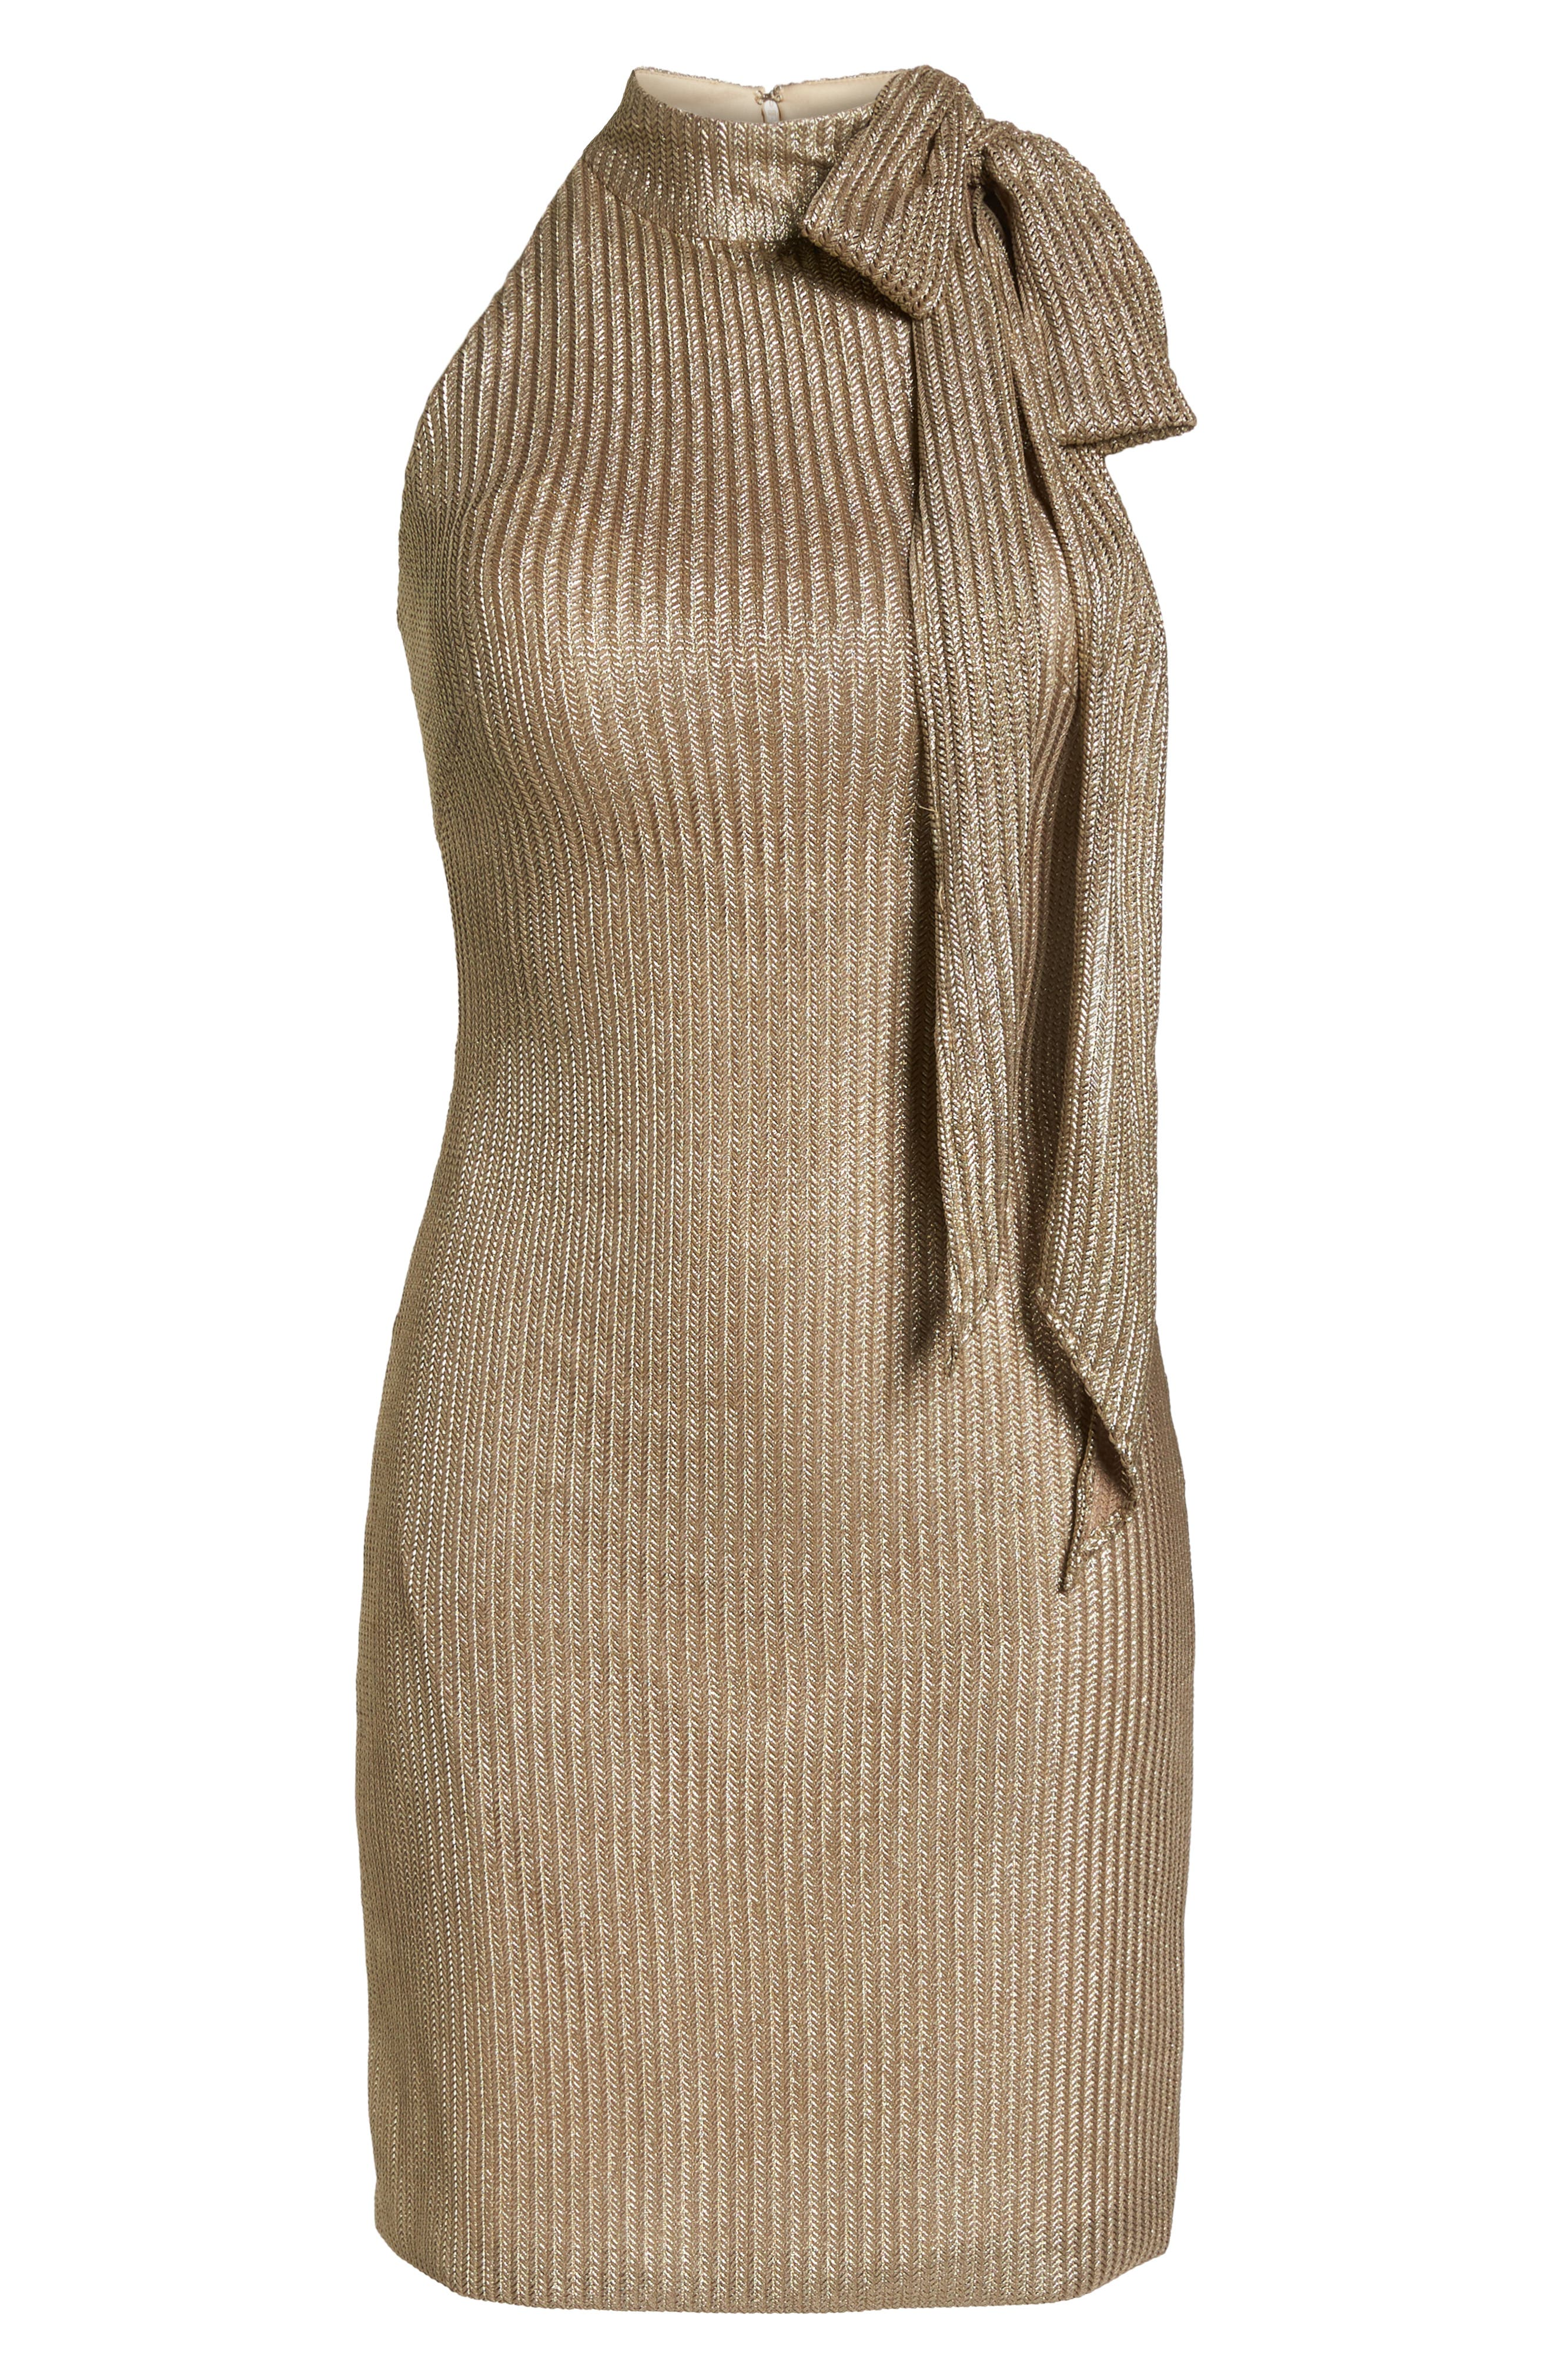 Tie Neck Body-Con Dress,                             Alternate thumbnail 6, color,                             Gold